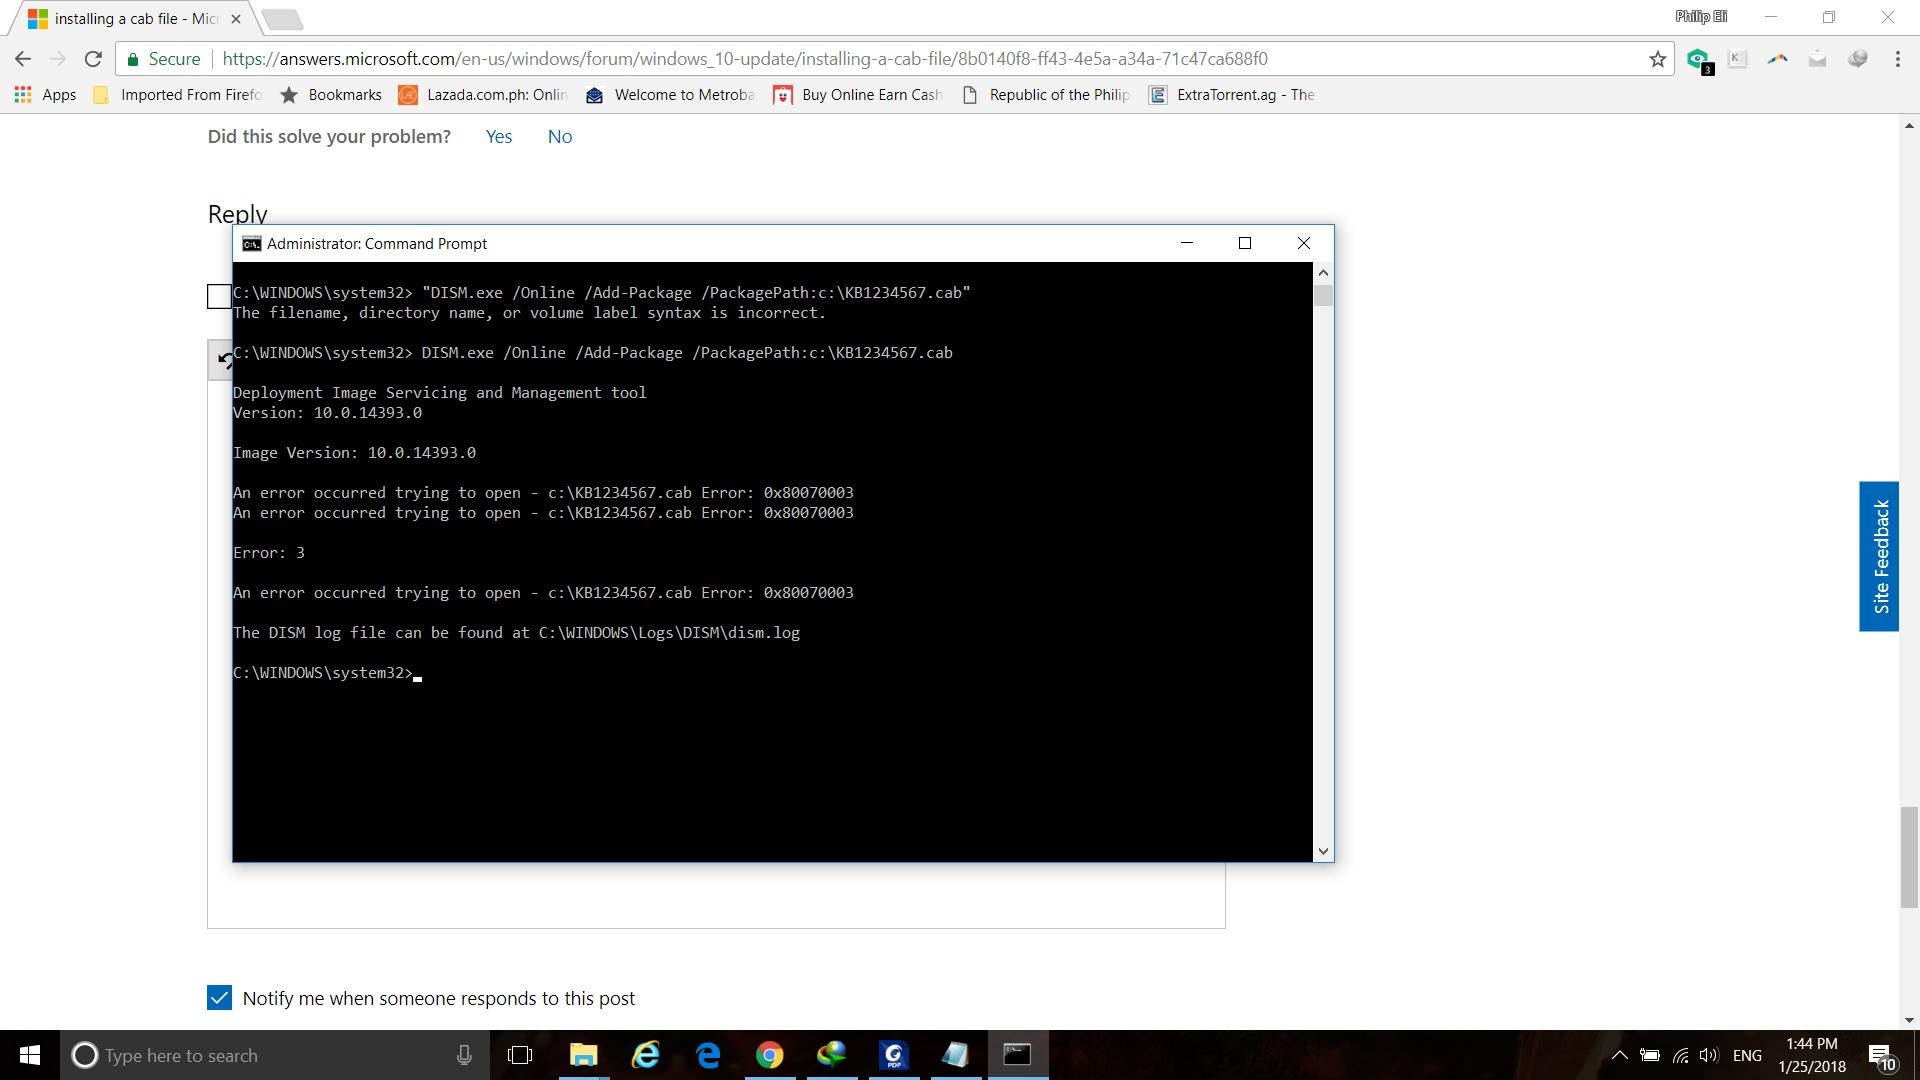 installing a cab file - Microsoft Community